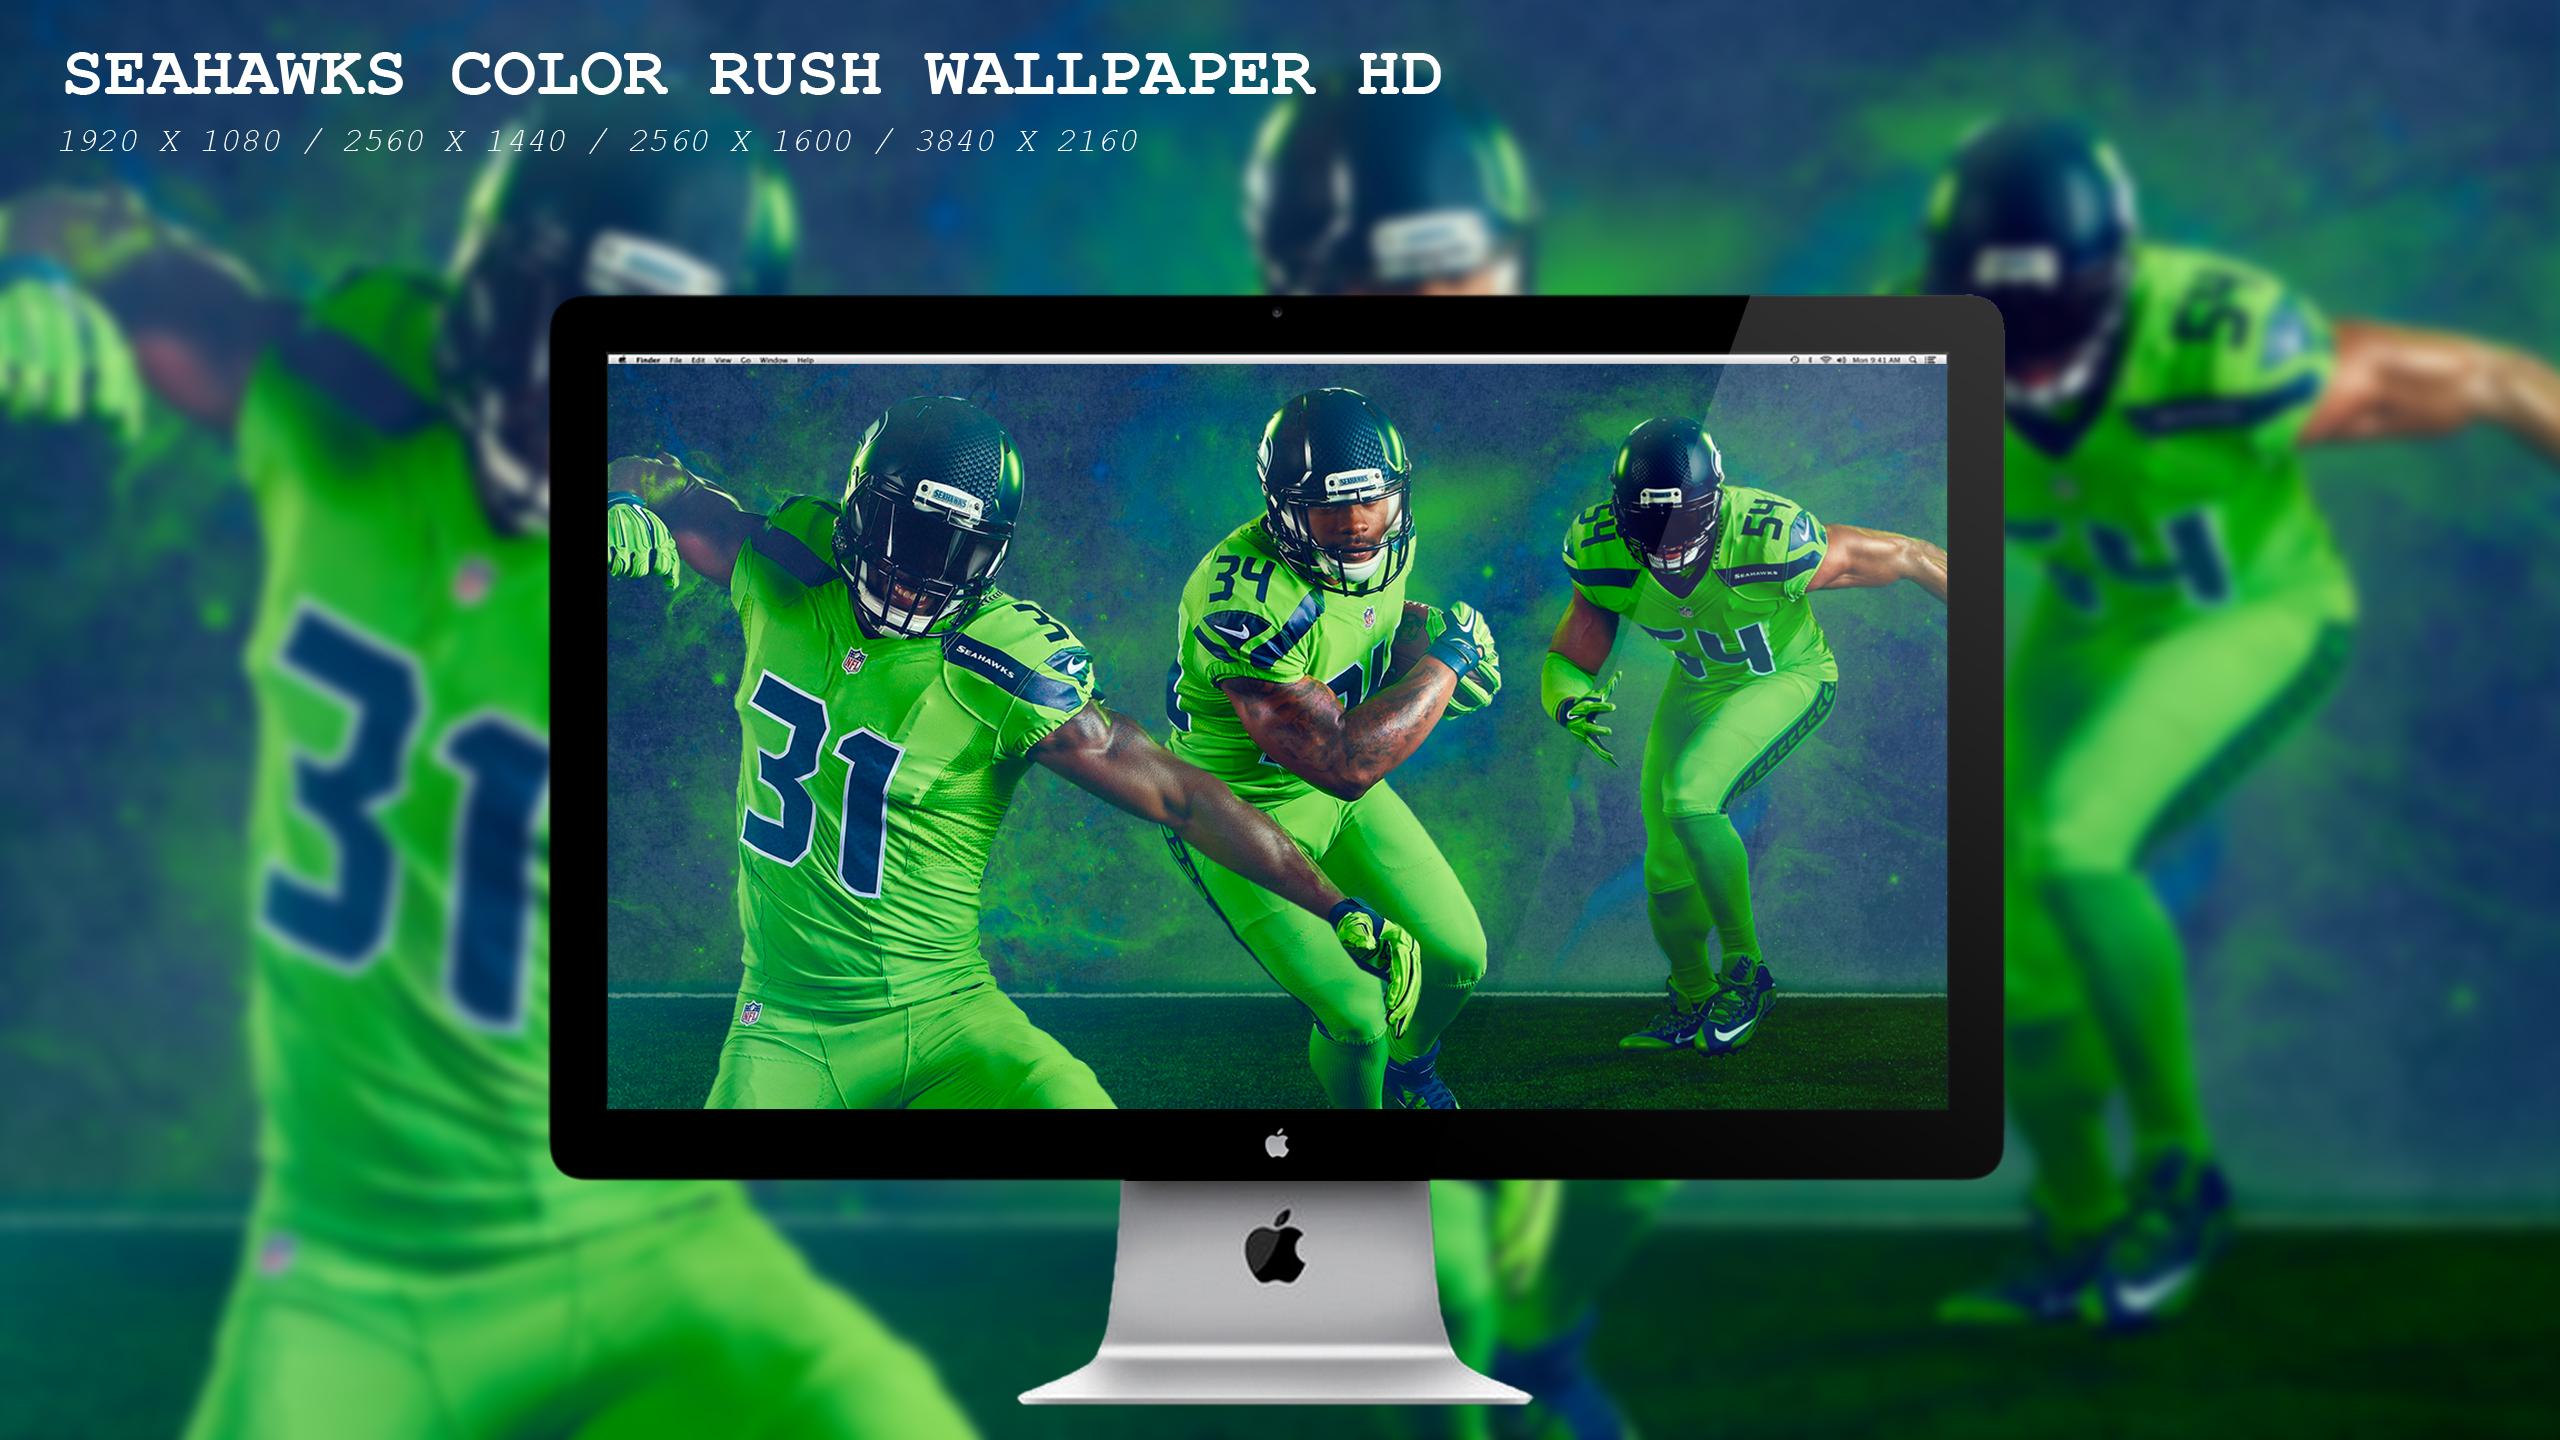 Seahawks super bowl wallpaper hd